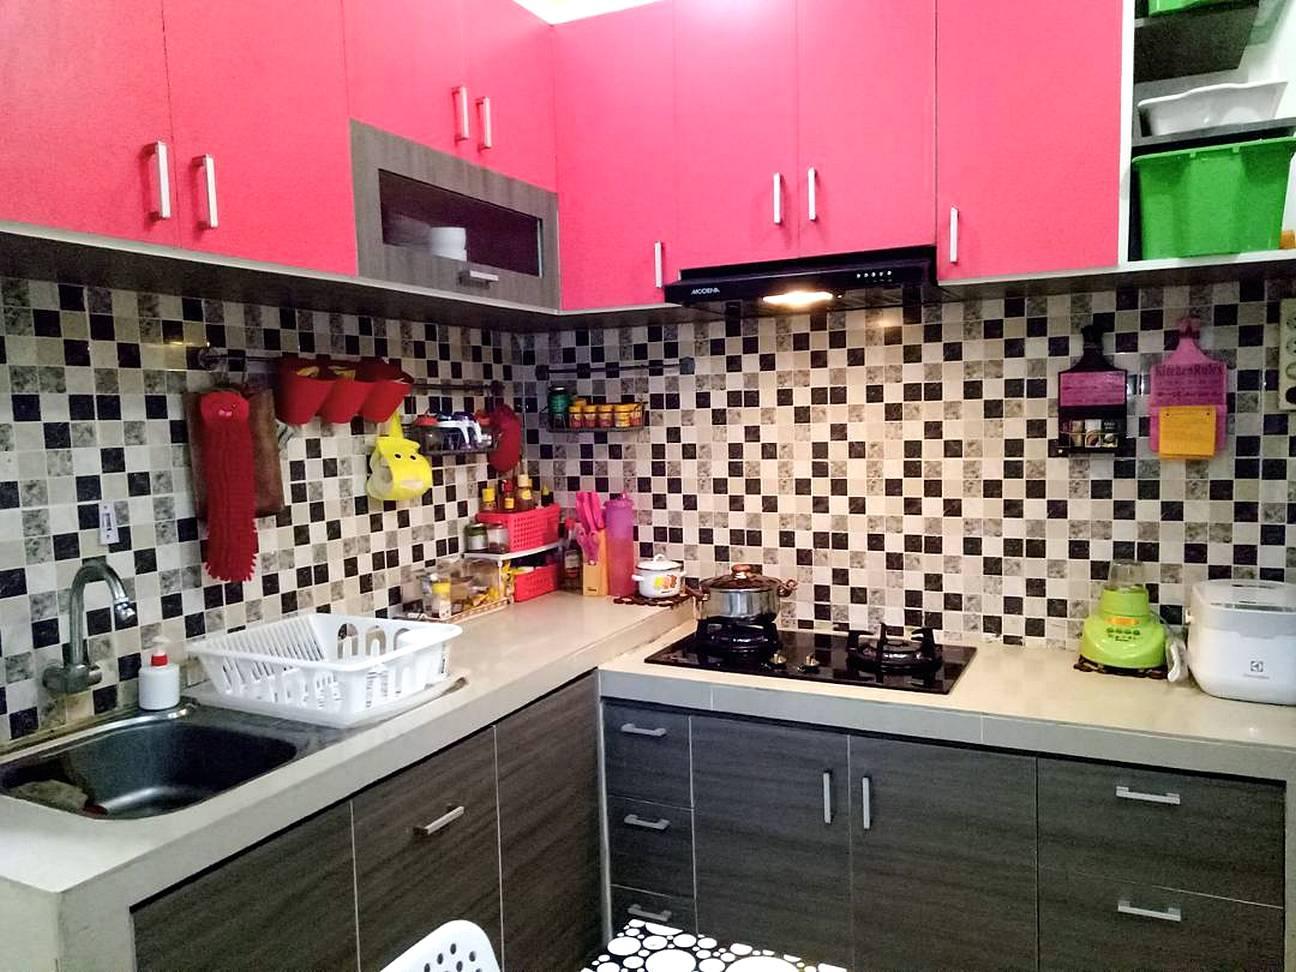 Keramik Dinding Dapur Unik Dan Cantik Untuk Sederhana Anda